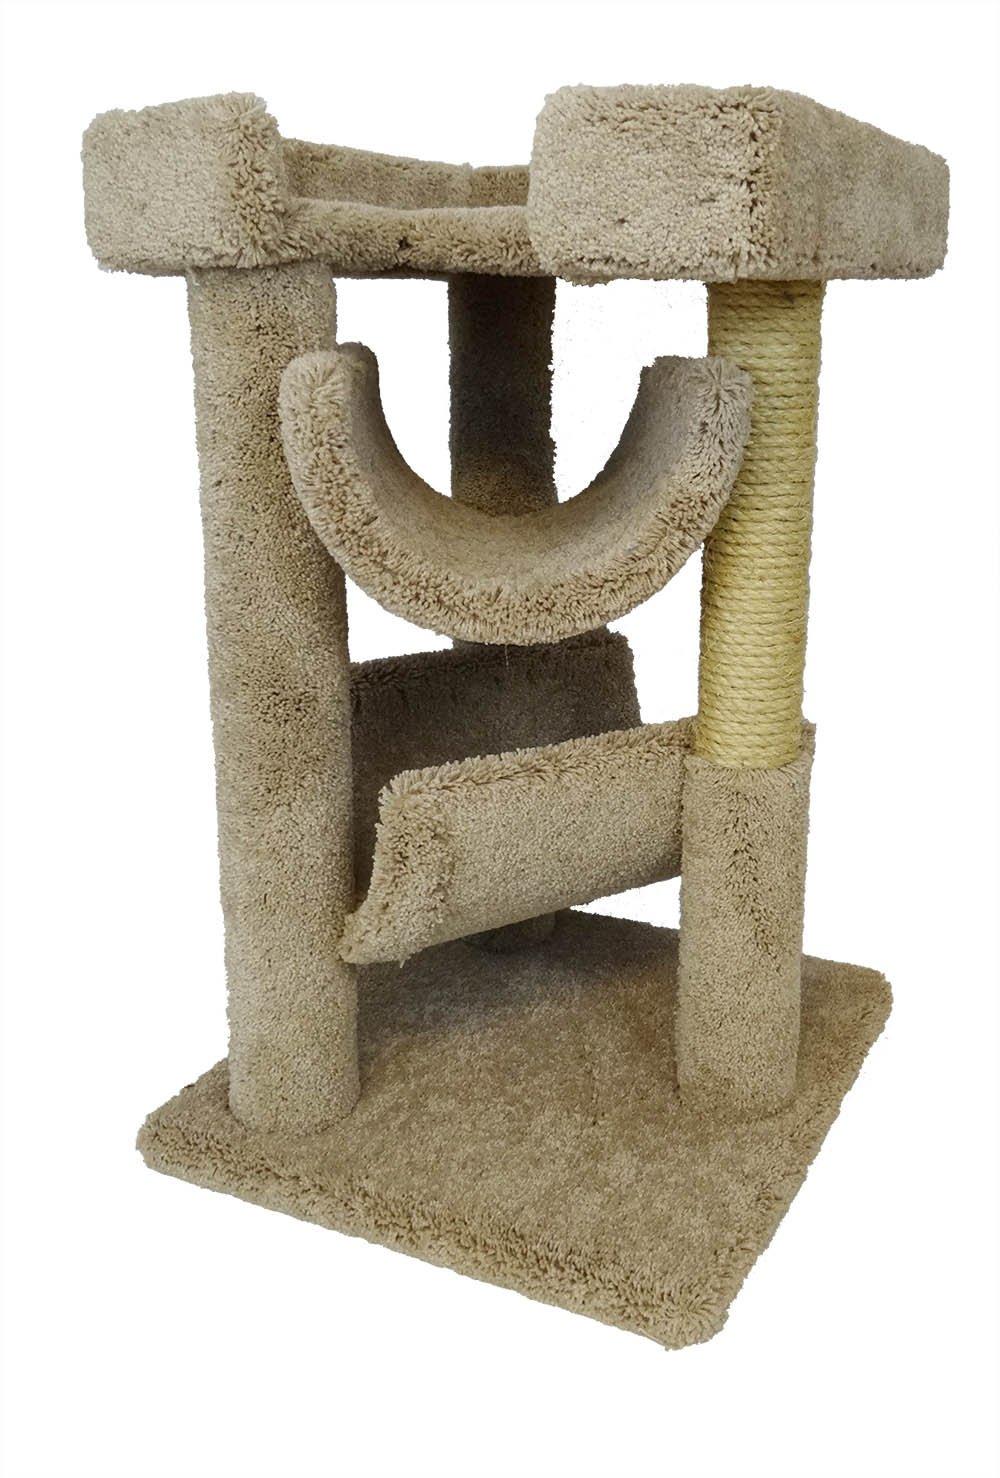 New Cat Condos Premier Cat Scratch and Lounge Beige